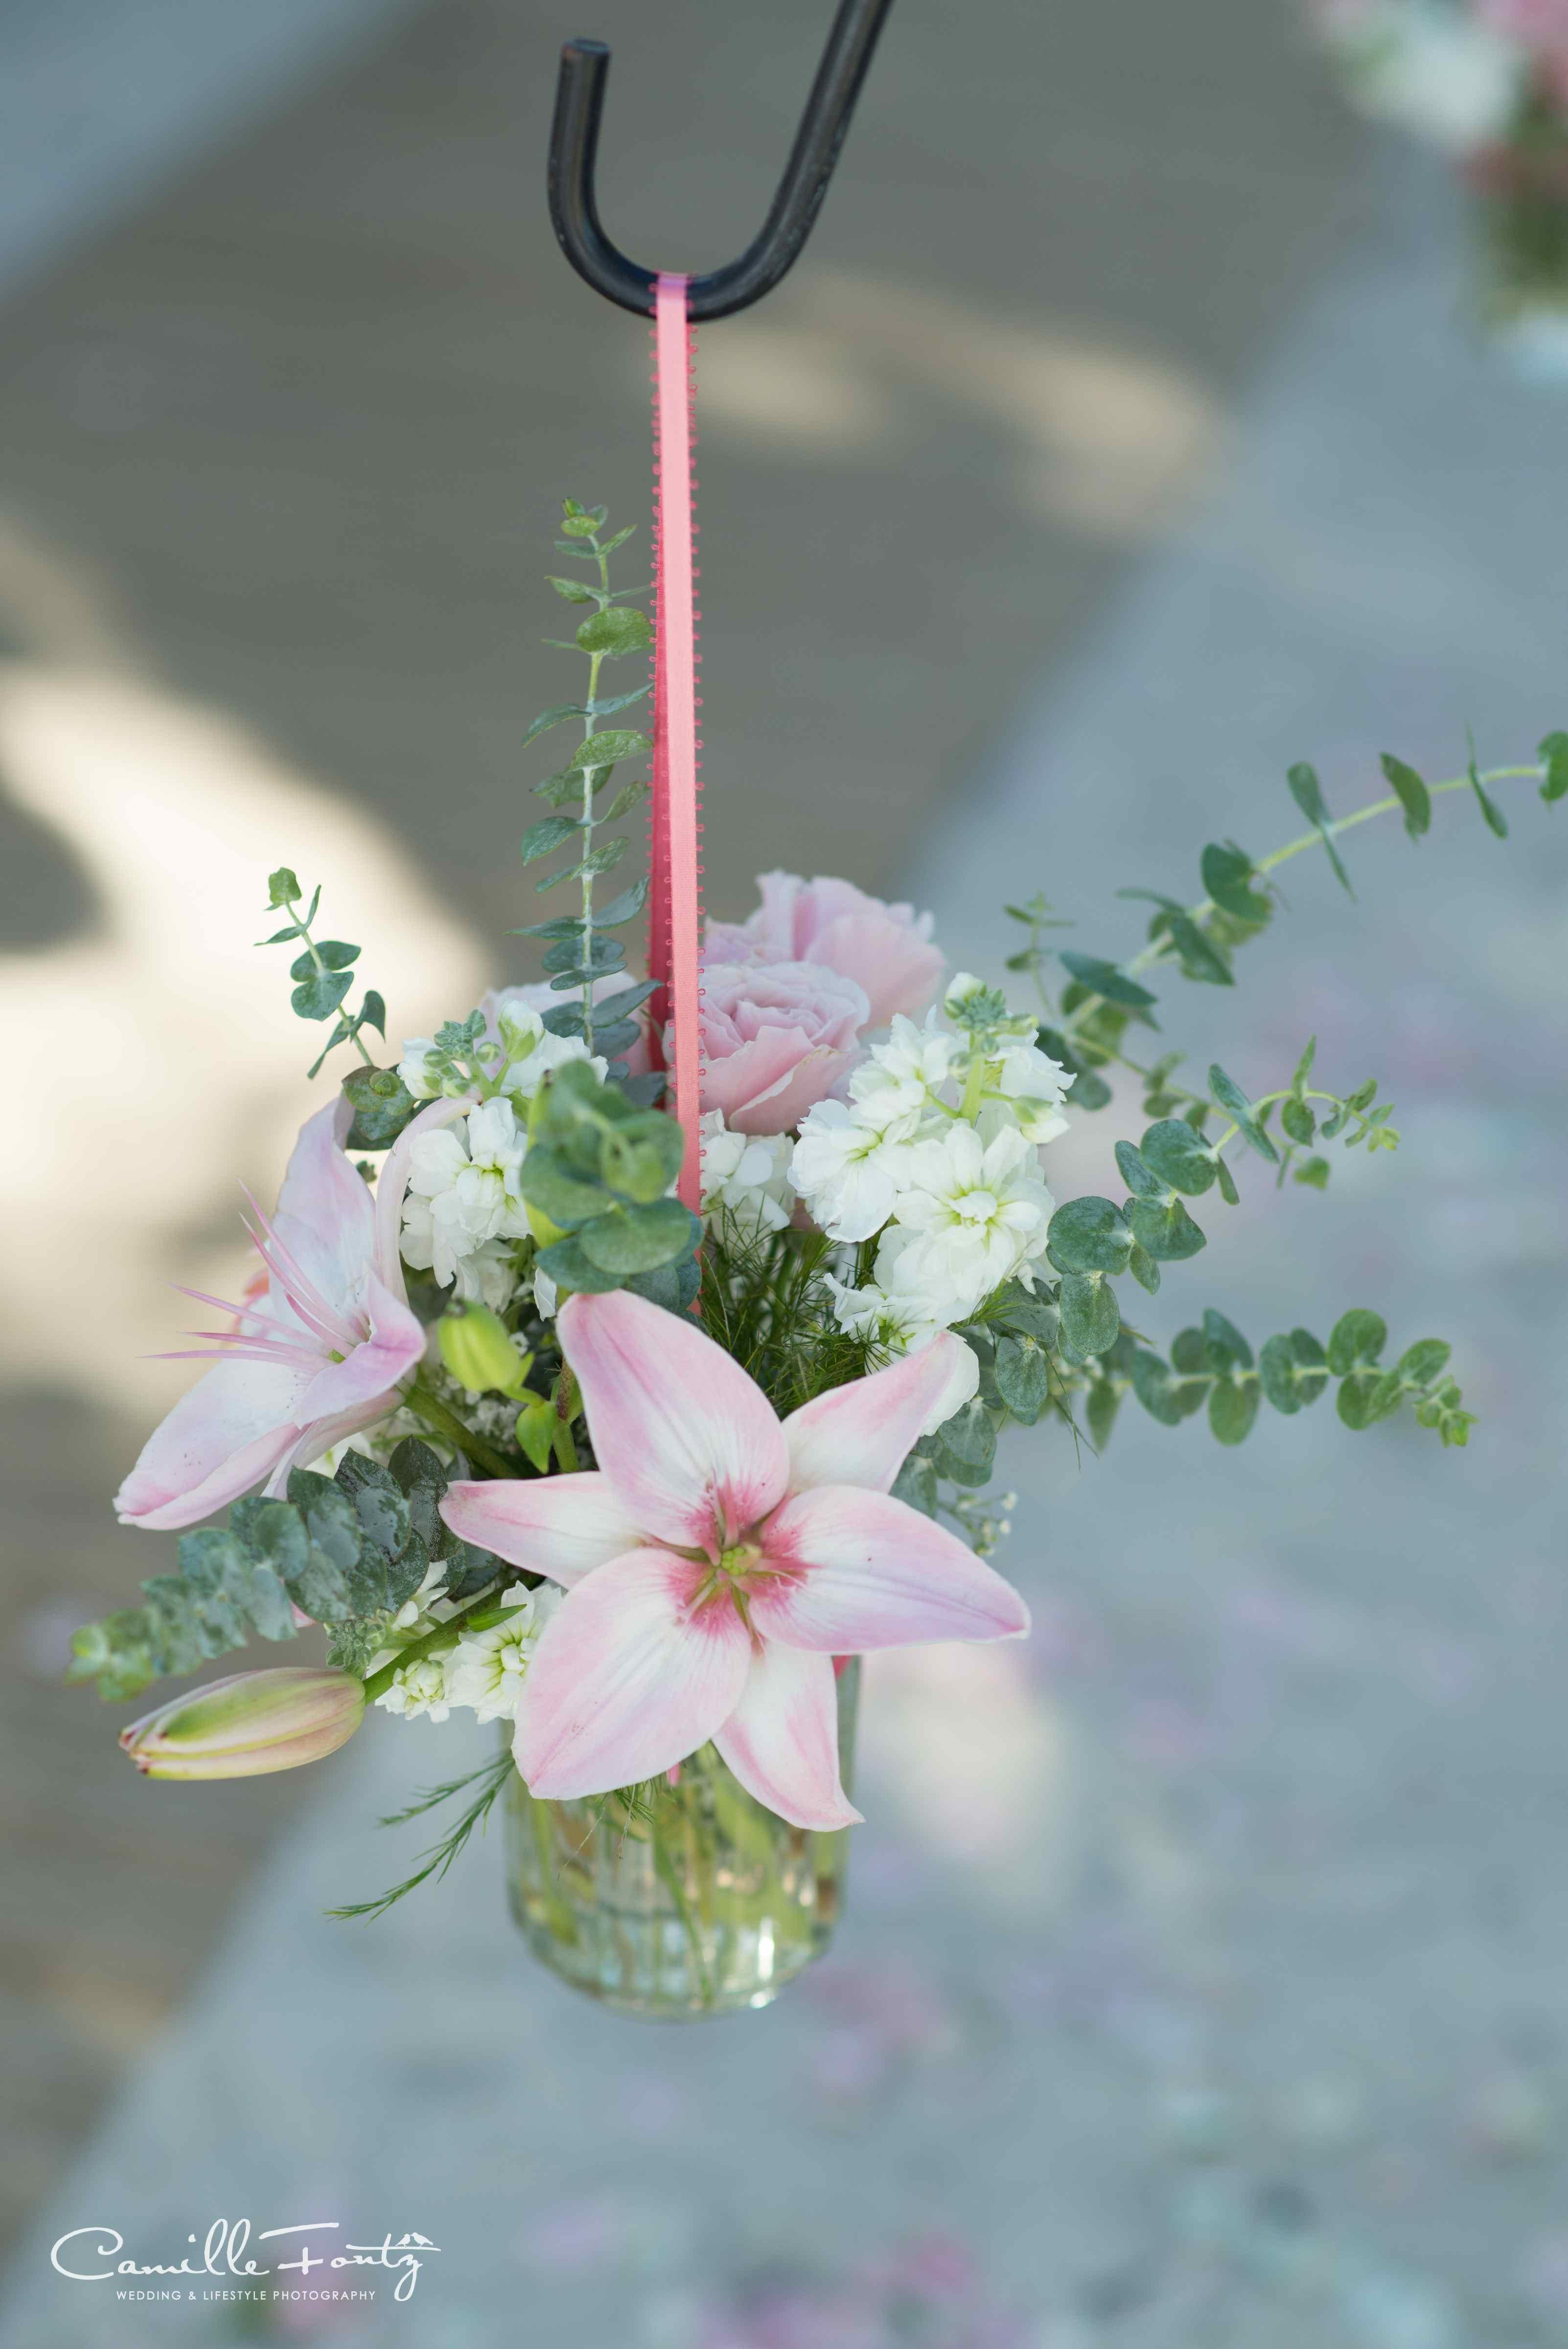 pink lilly & eucaliptus hanging from shepherds hook